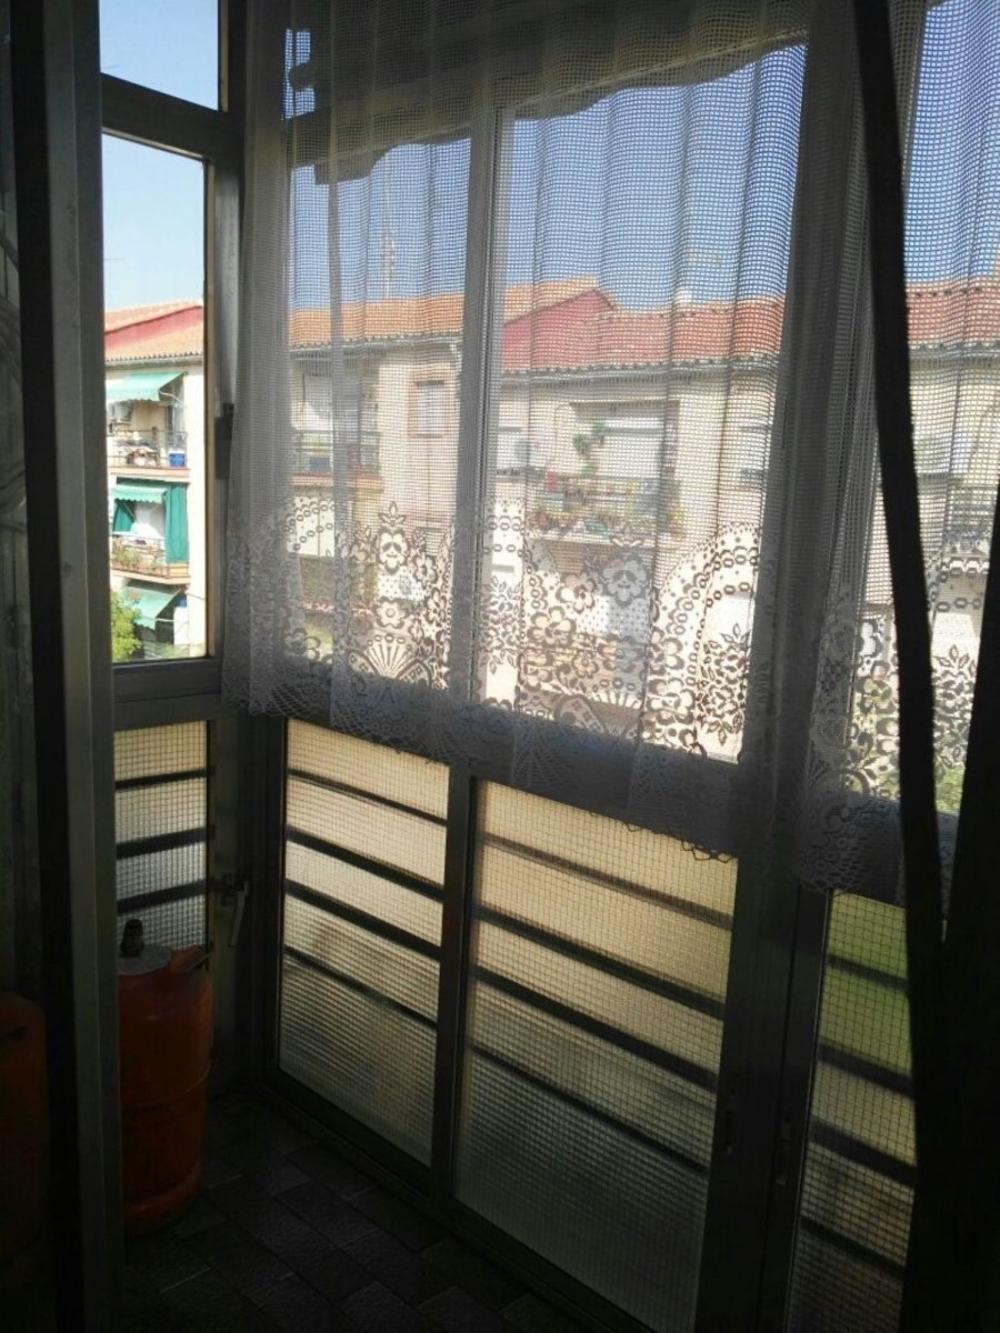 carabanchel-vista alegre madrid piso foto 3055556